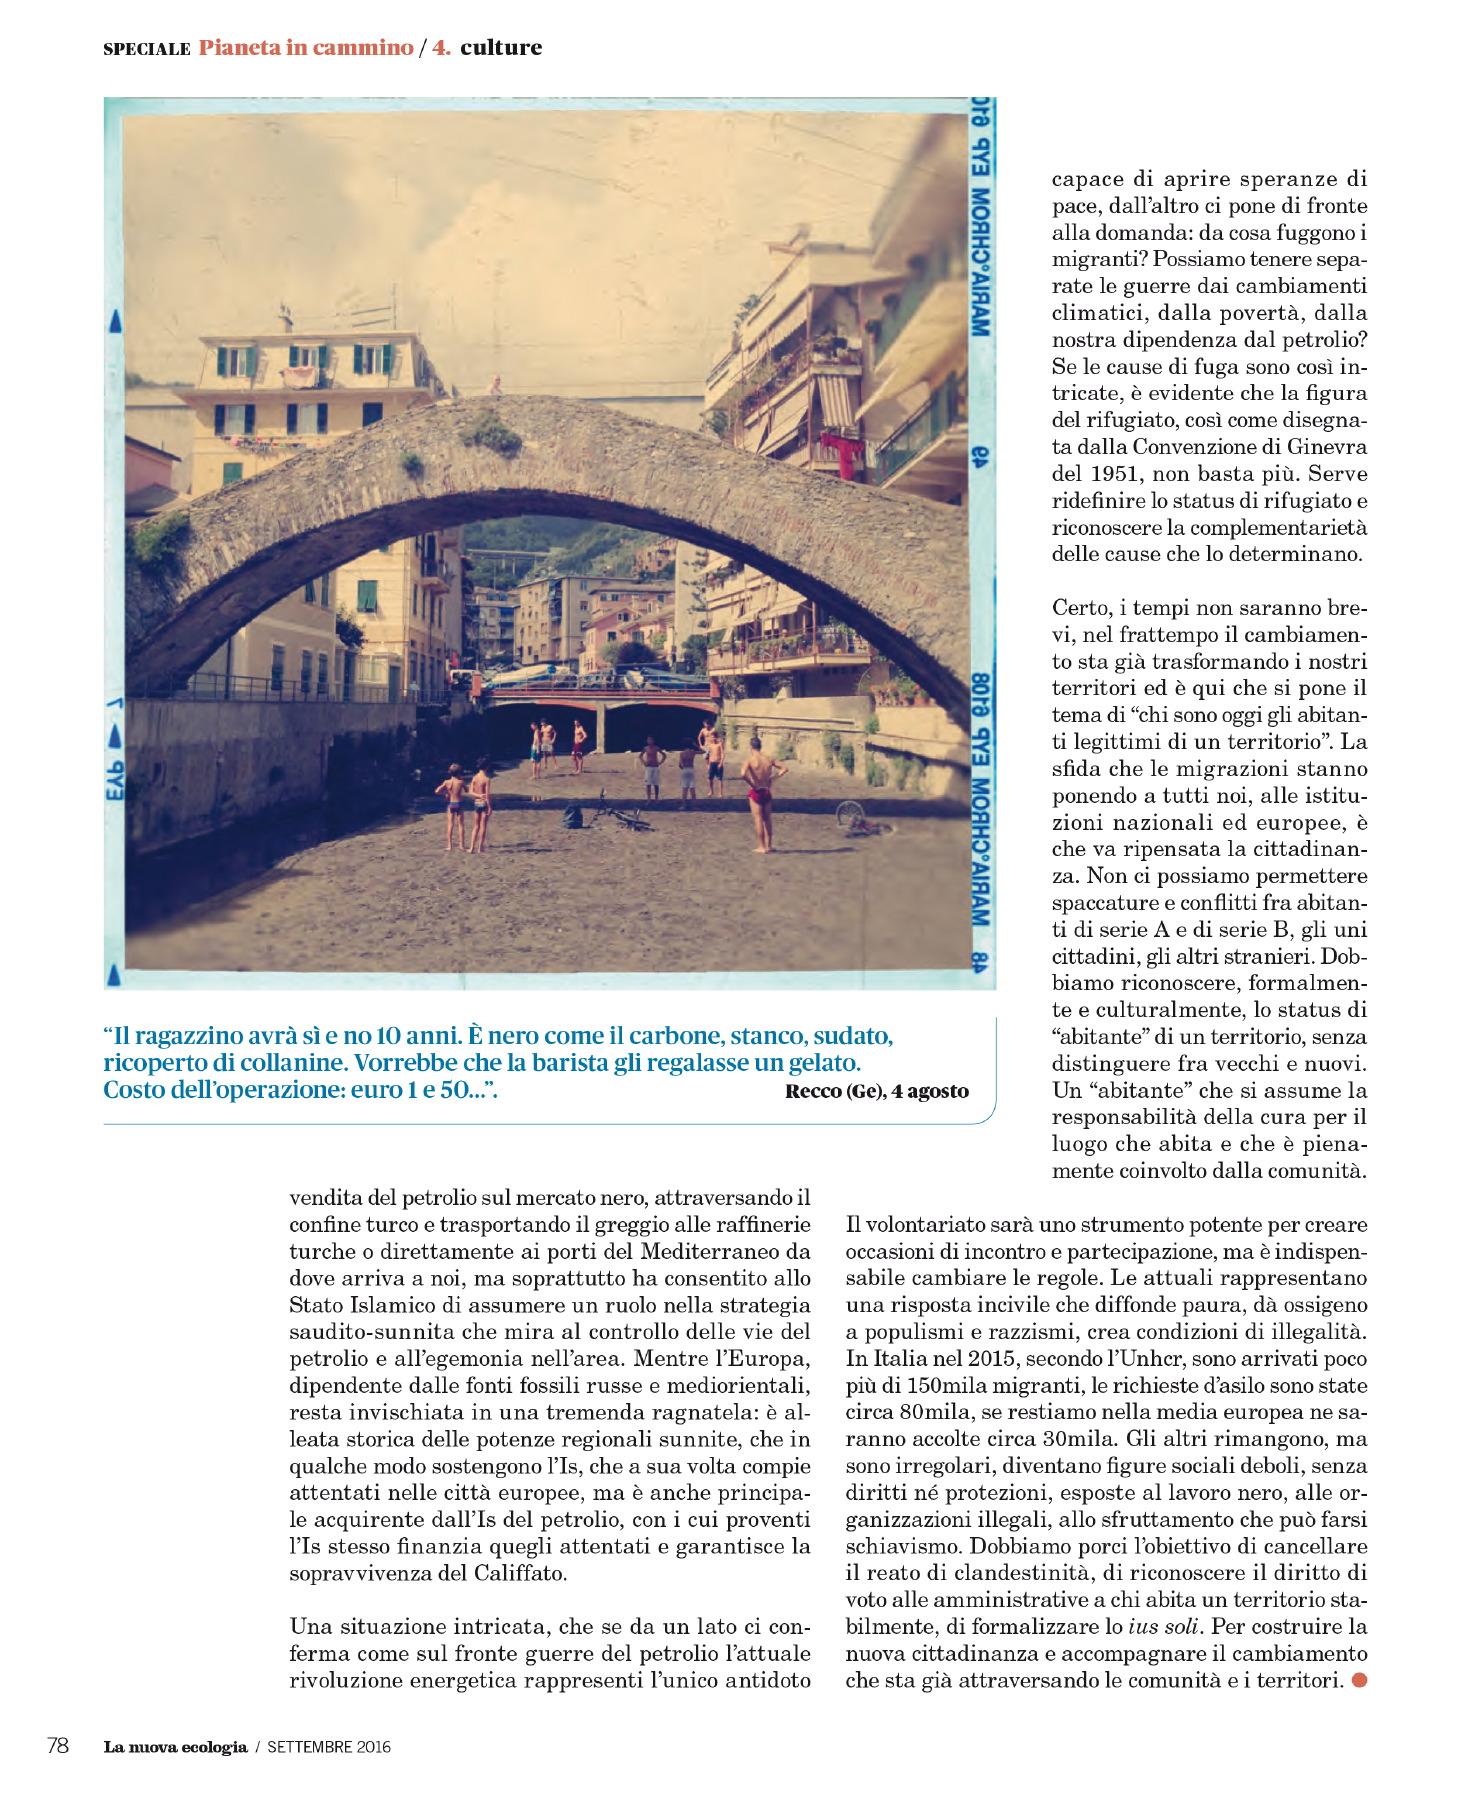 around-the-walk-_-pietro-vertamy-_tearsheet-nuova-ecologia-09